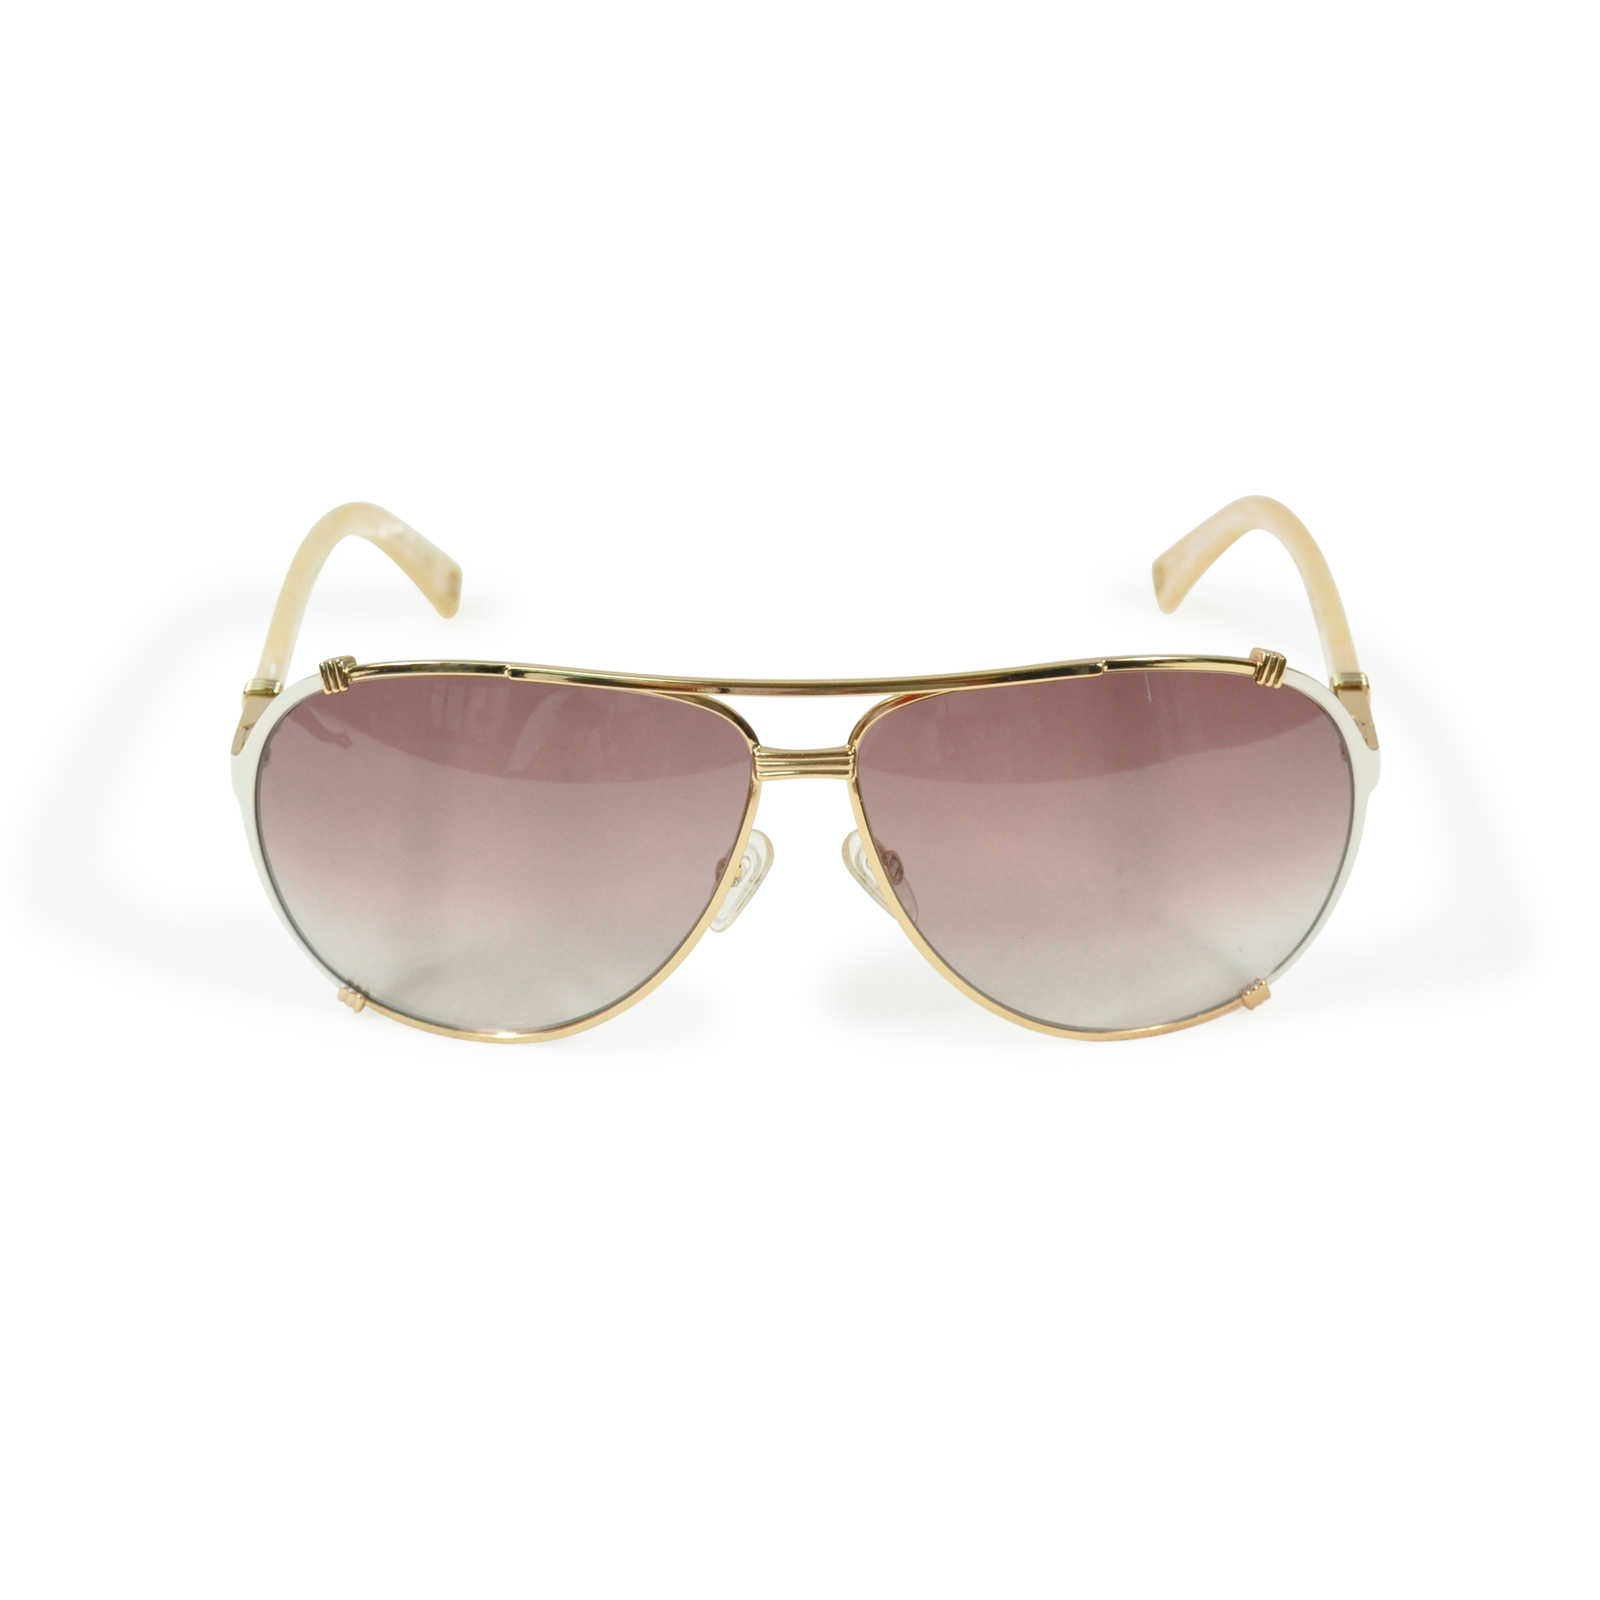 f45fc2dbd116 ... Authentic Second Hand Dior 'Chicago 2 Strass' Aviator Sunglasses  (PSS-200- ...